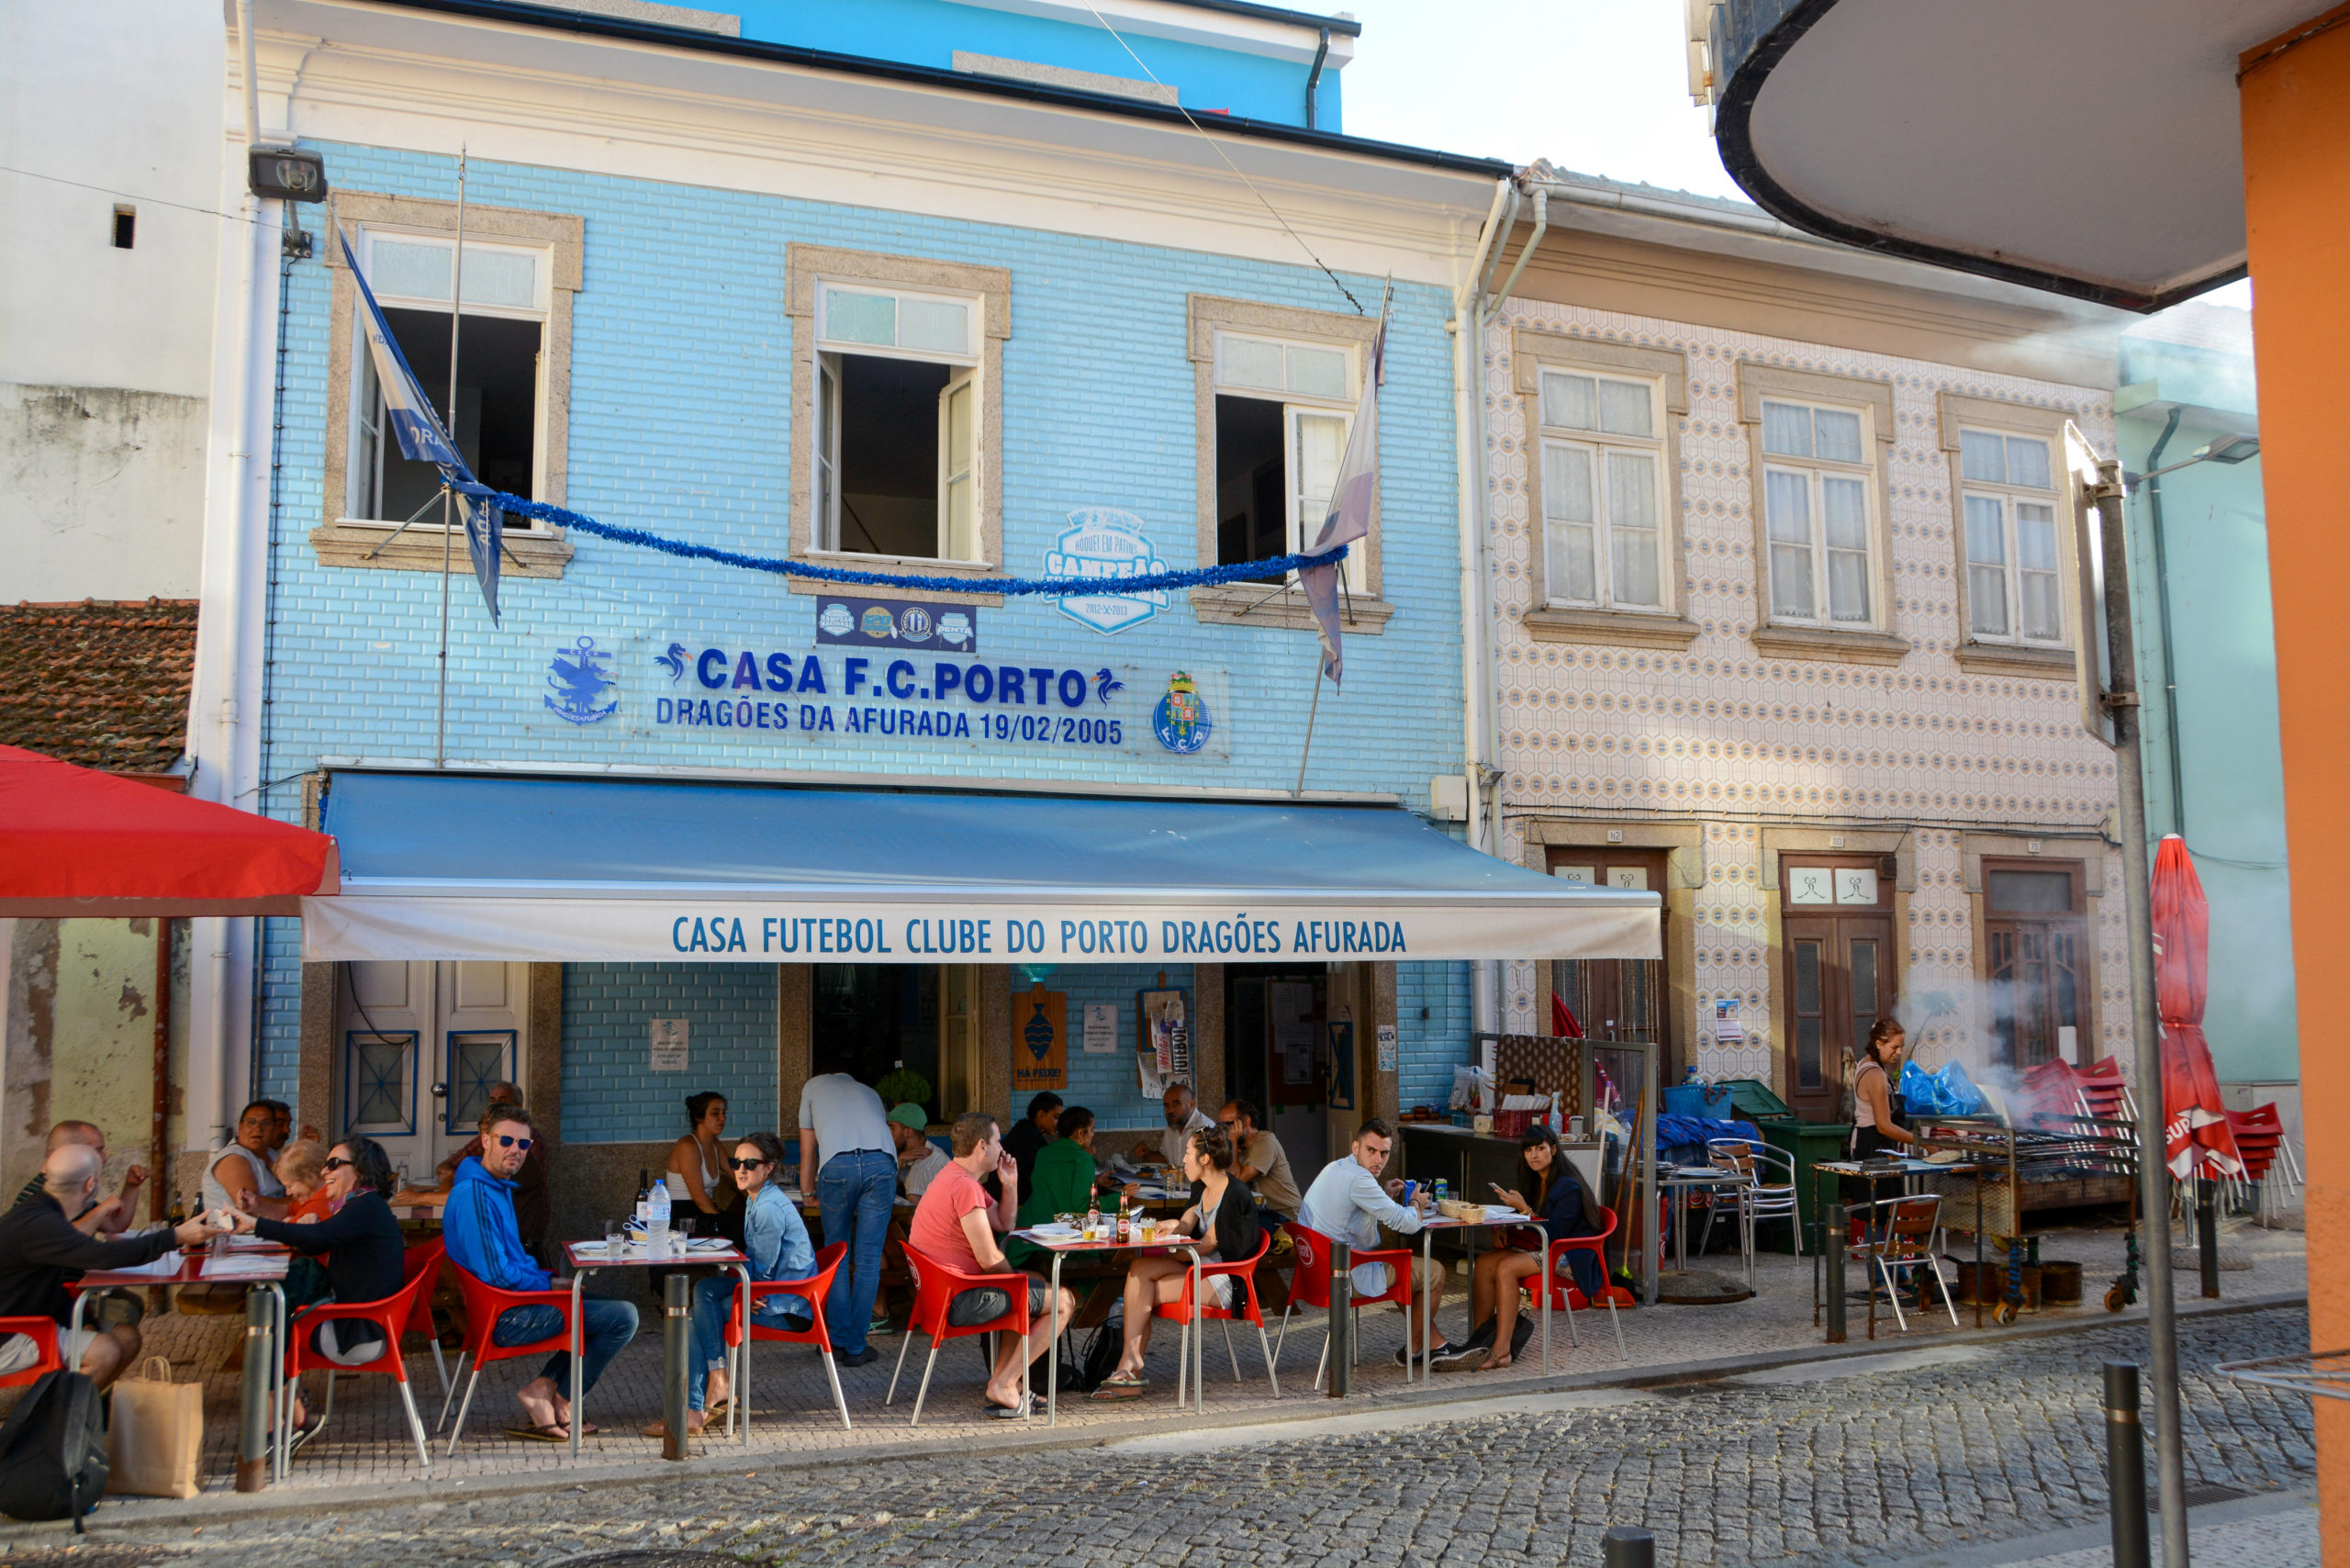 Restaurant in Arufada bei Porto